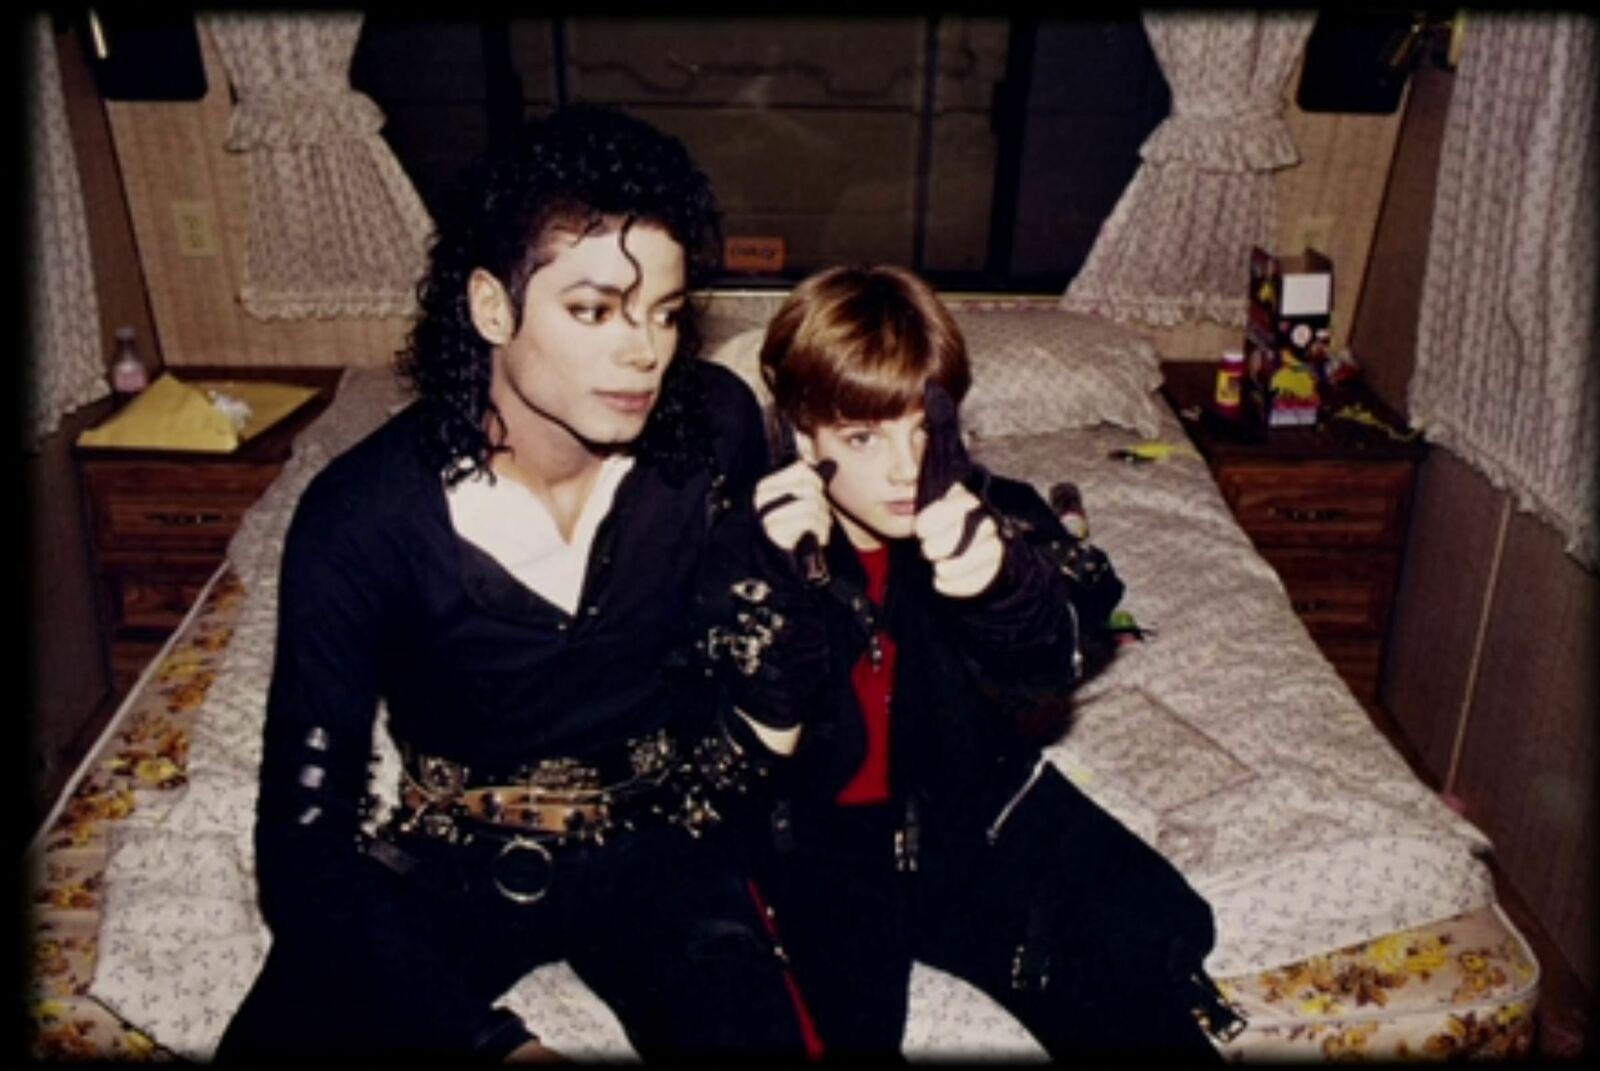 Michael Jackson - James Safechuck